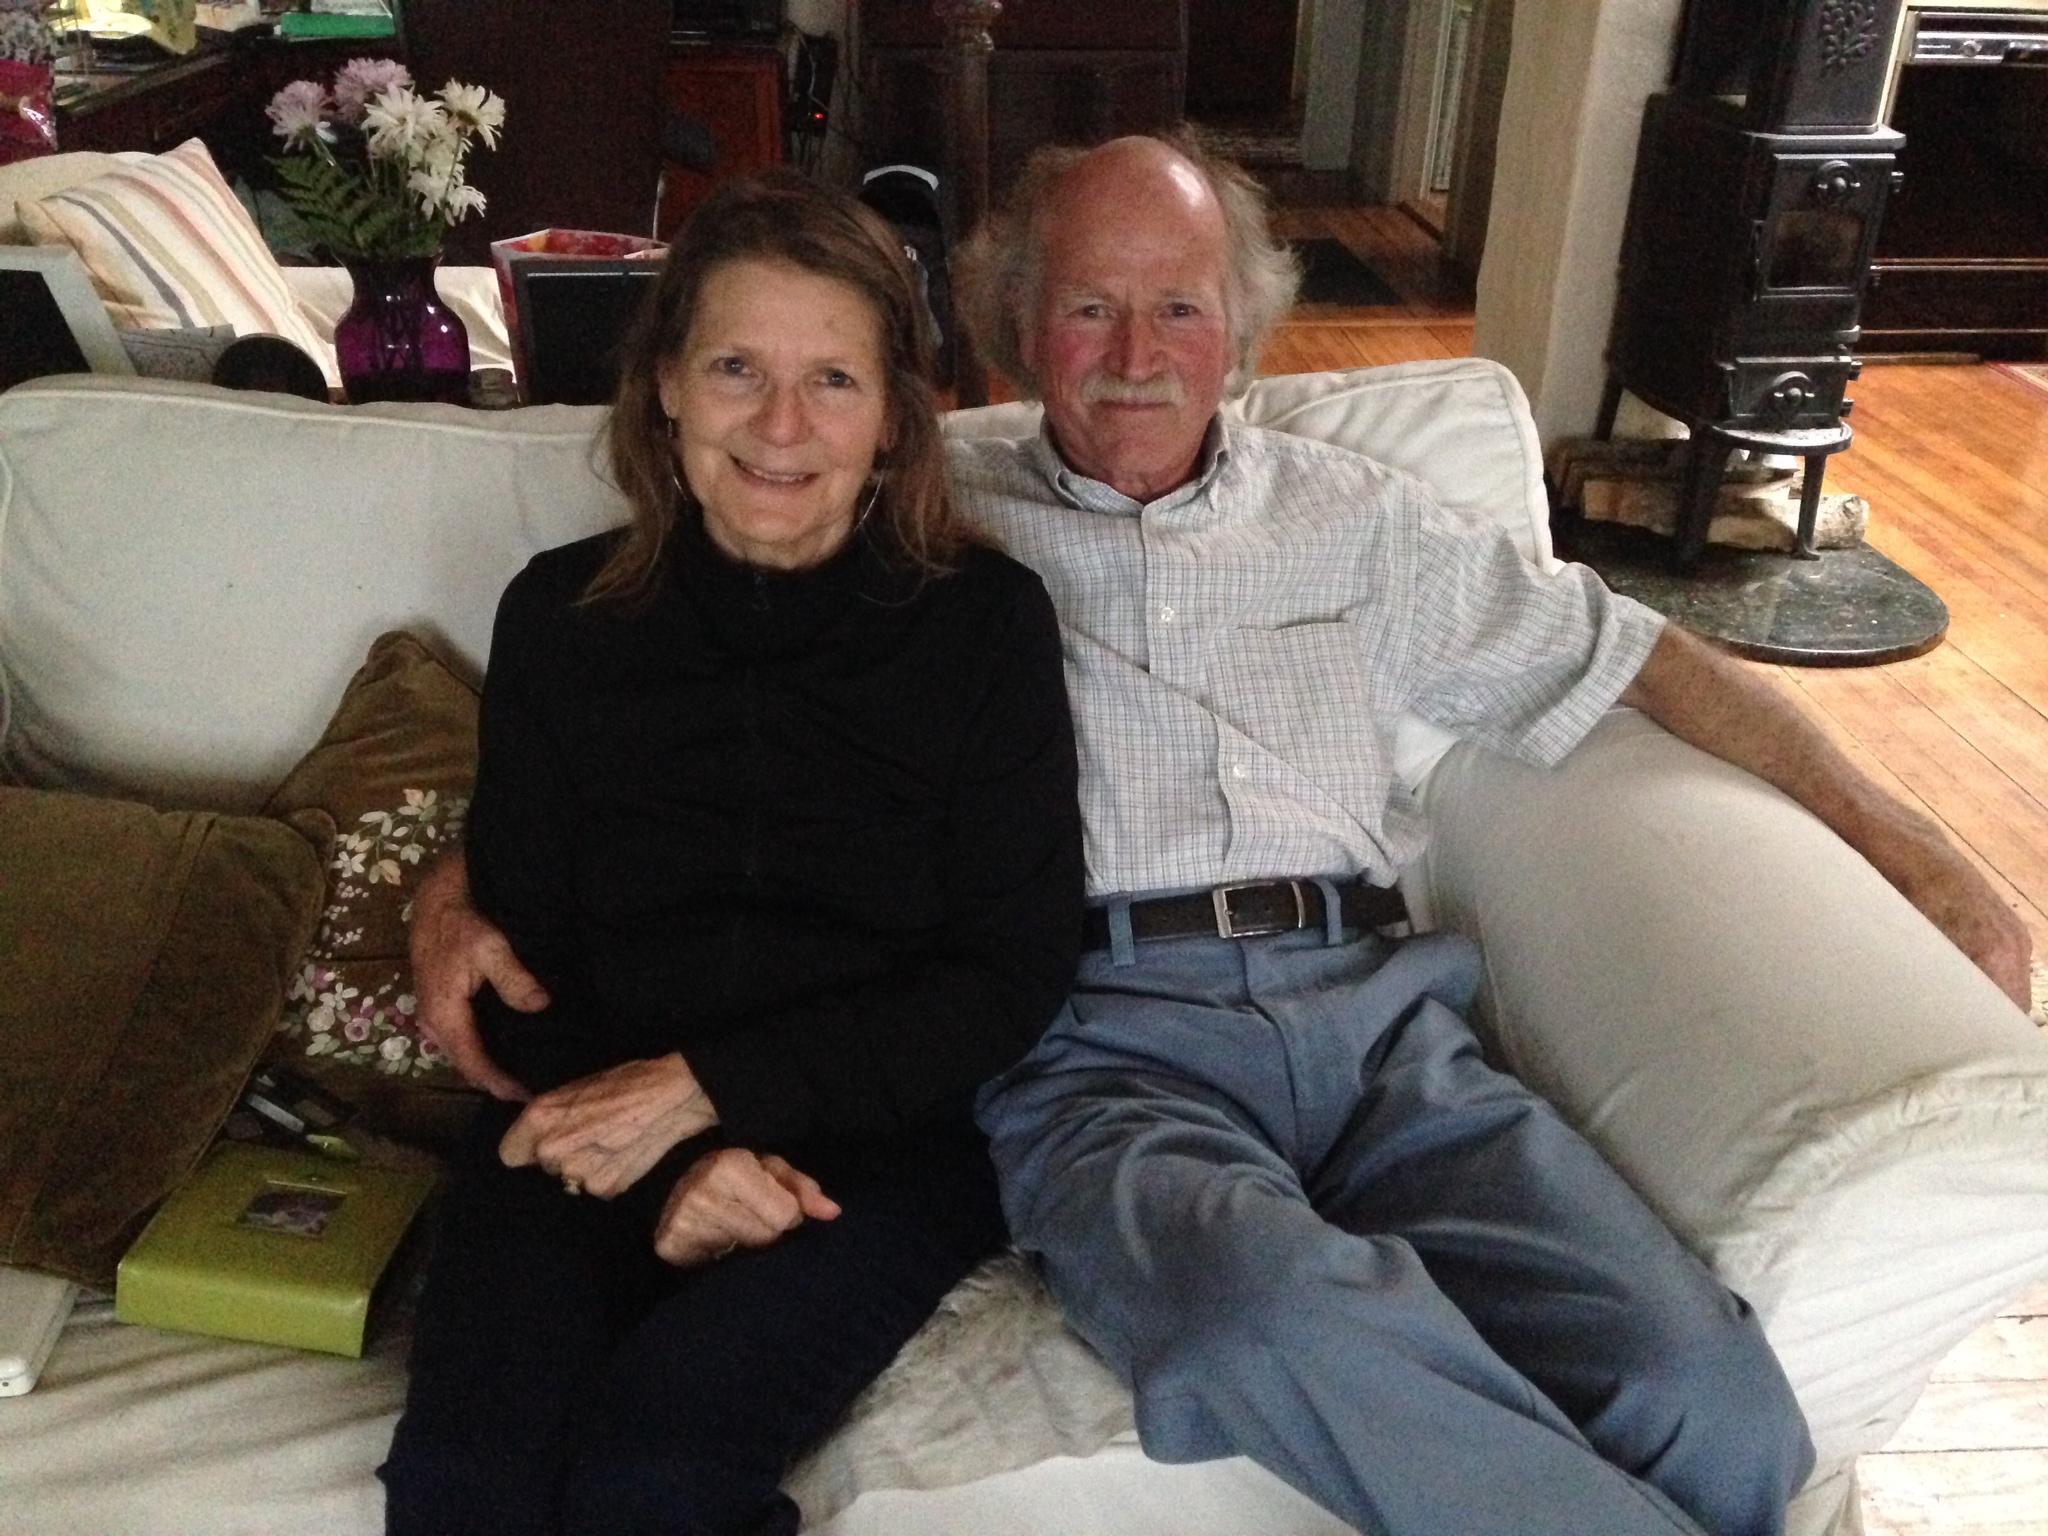 Jane and John Vose